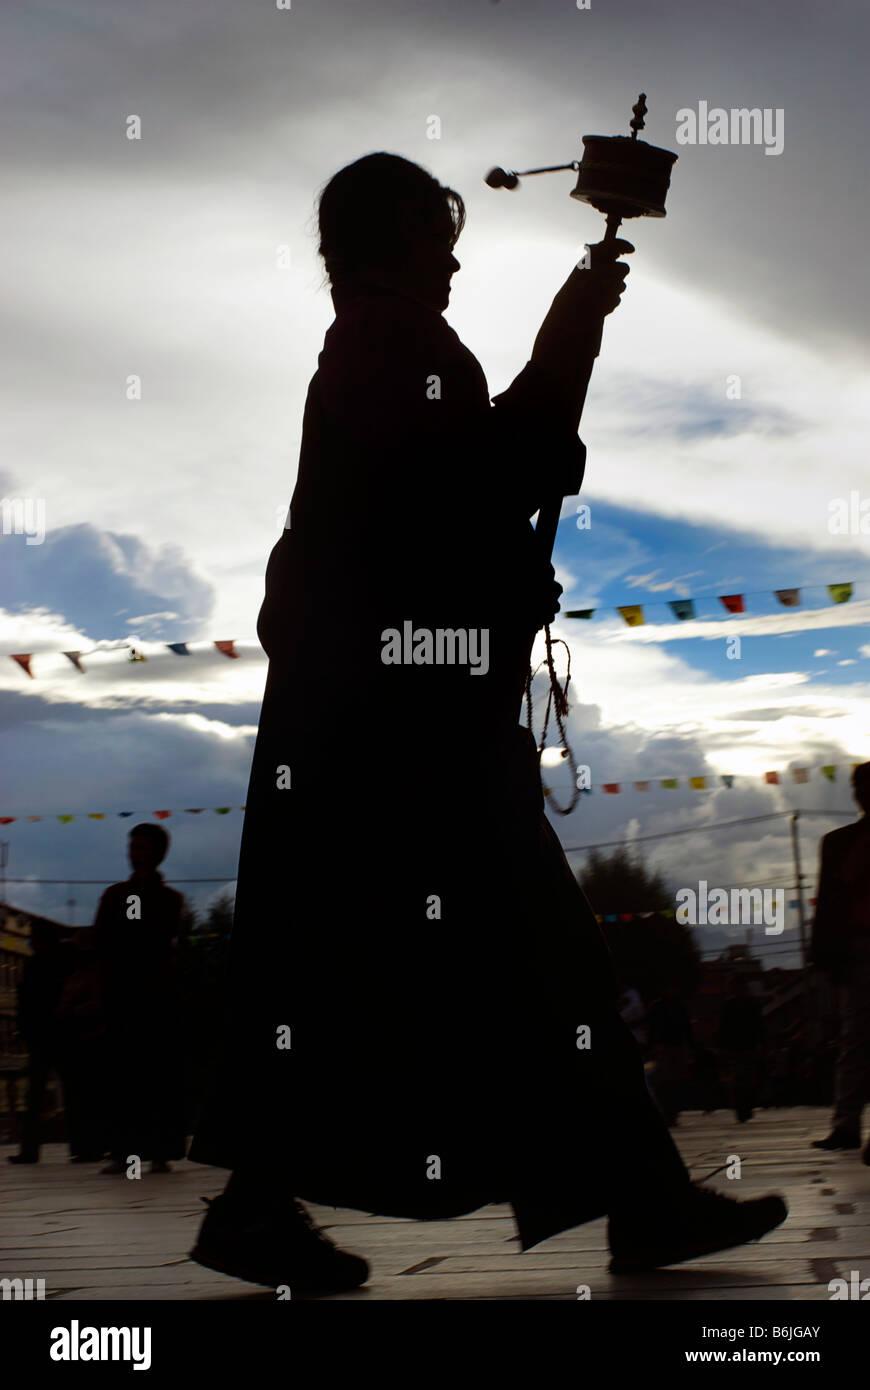 Silhouette of a Tibetan pilgrim spinning a prayerwheel as she makes a perumbulation of Jokhang monastery, Lhasa, - Stock Image